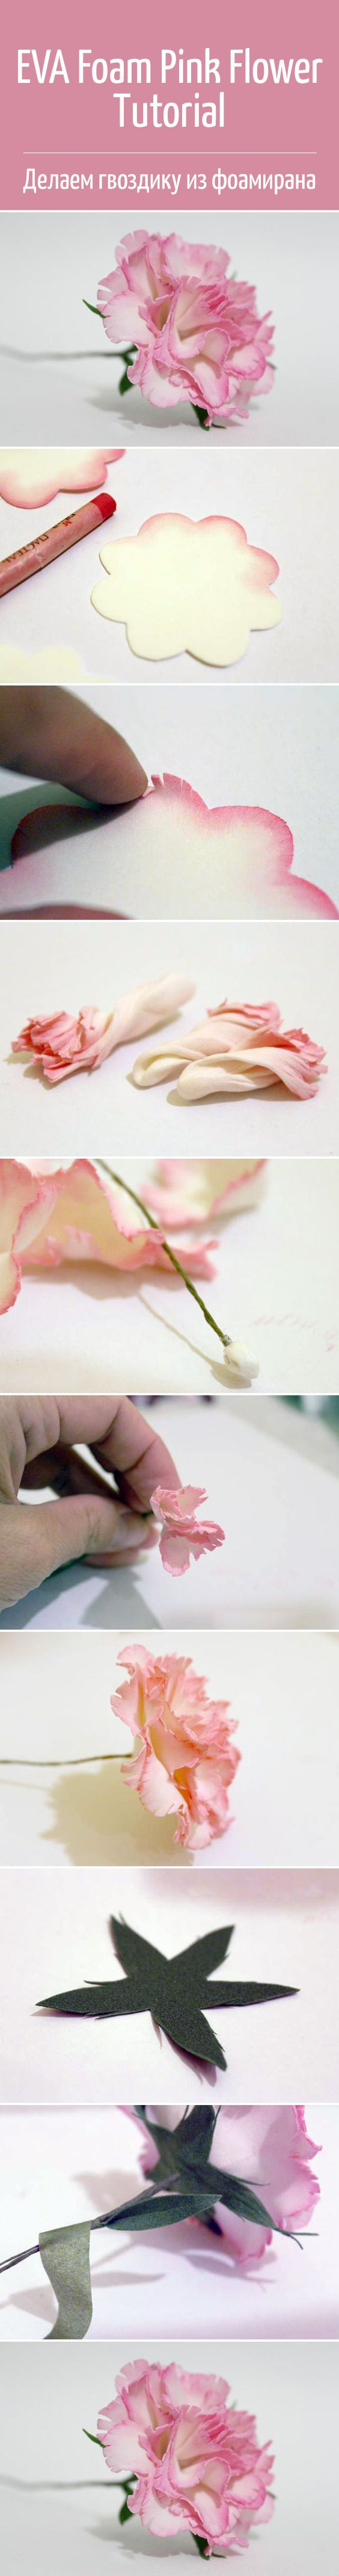 EVA Foam Pink Flower tutorial / Делаем гвоздику из фоамирана, мастер-класс